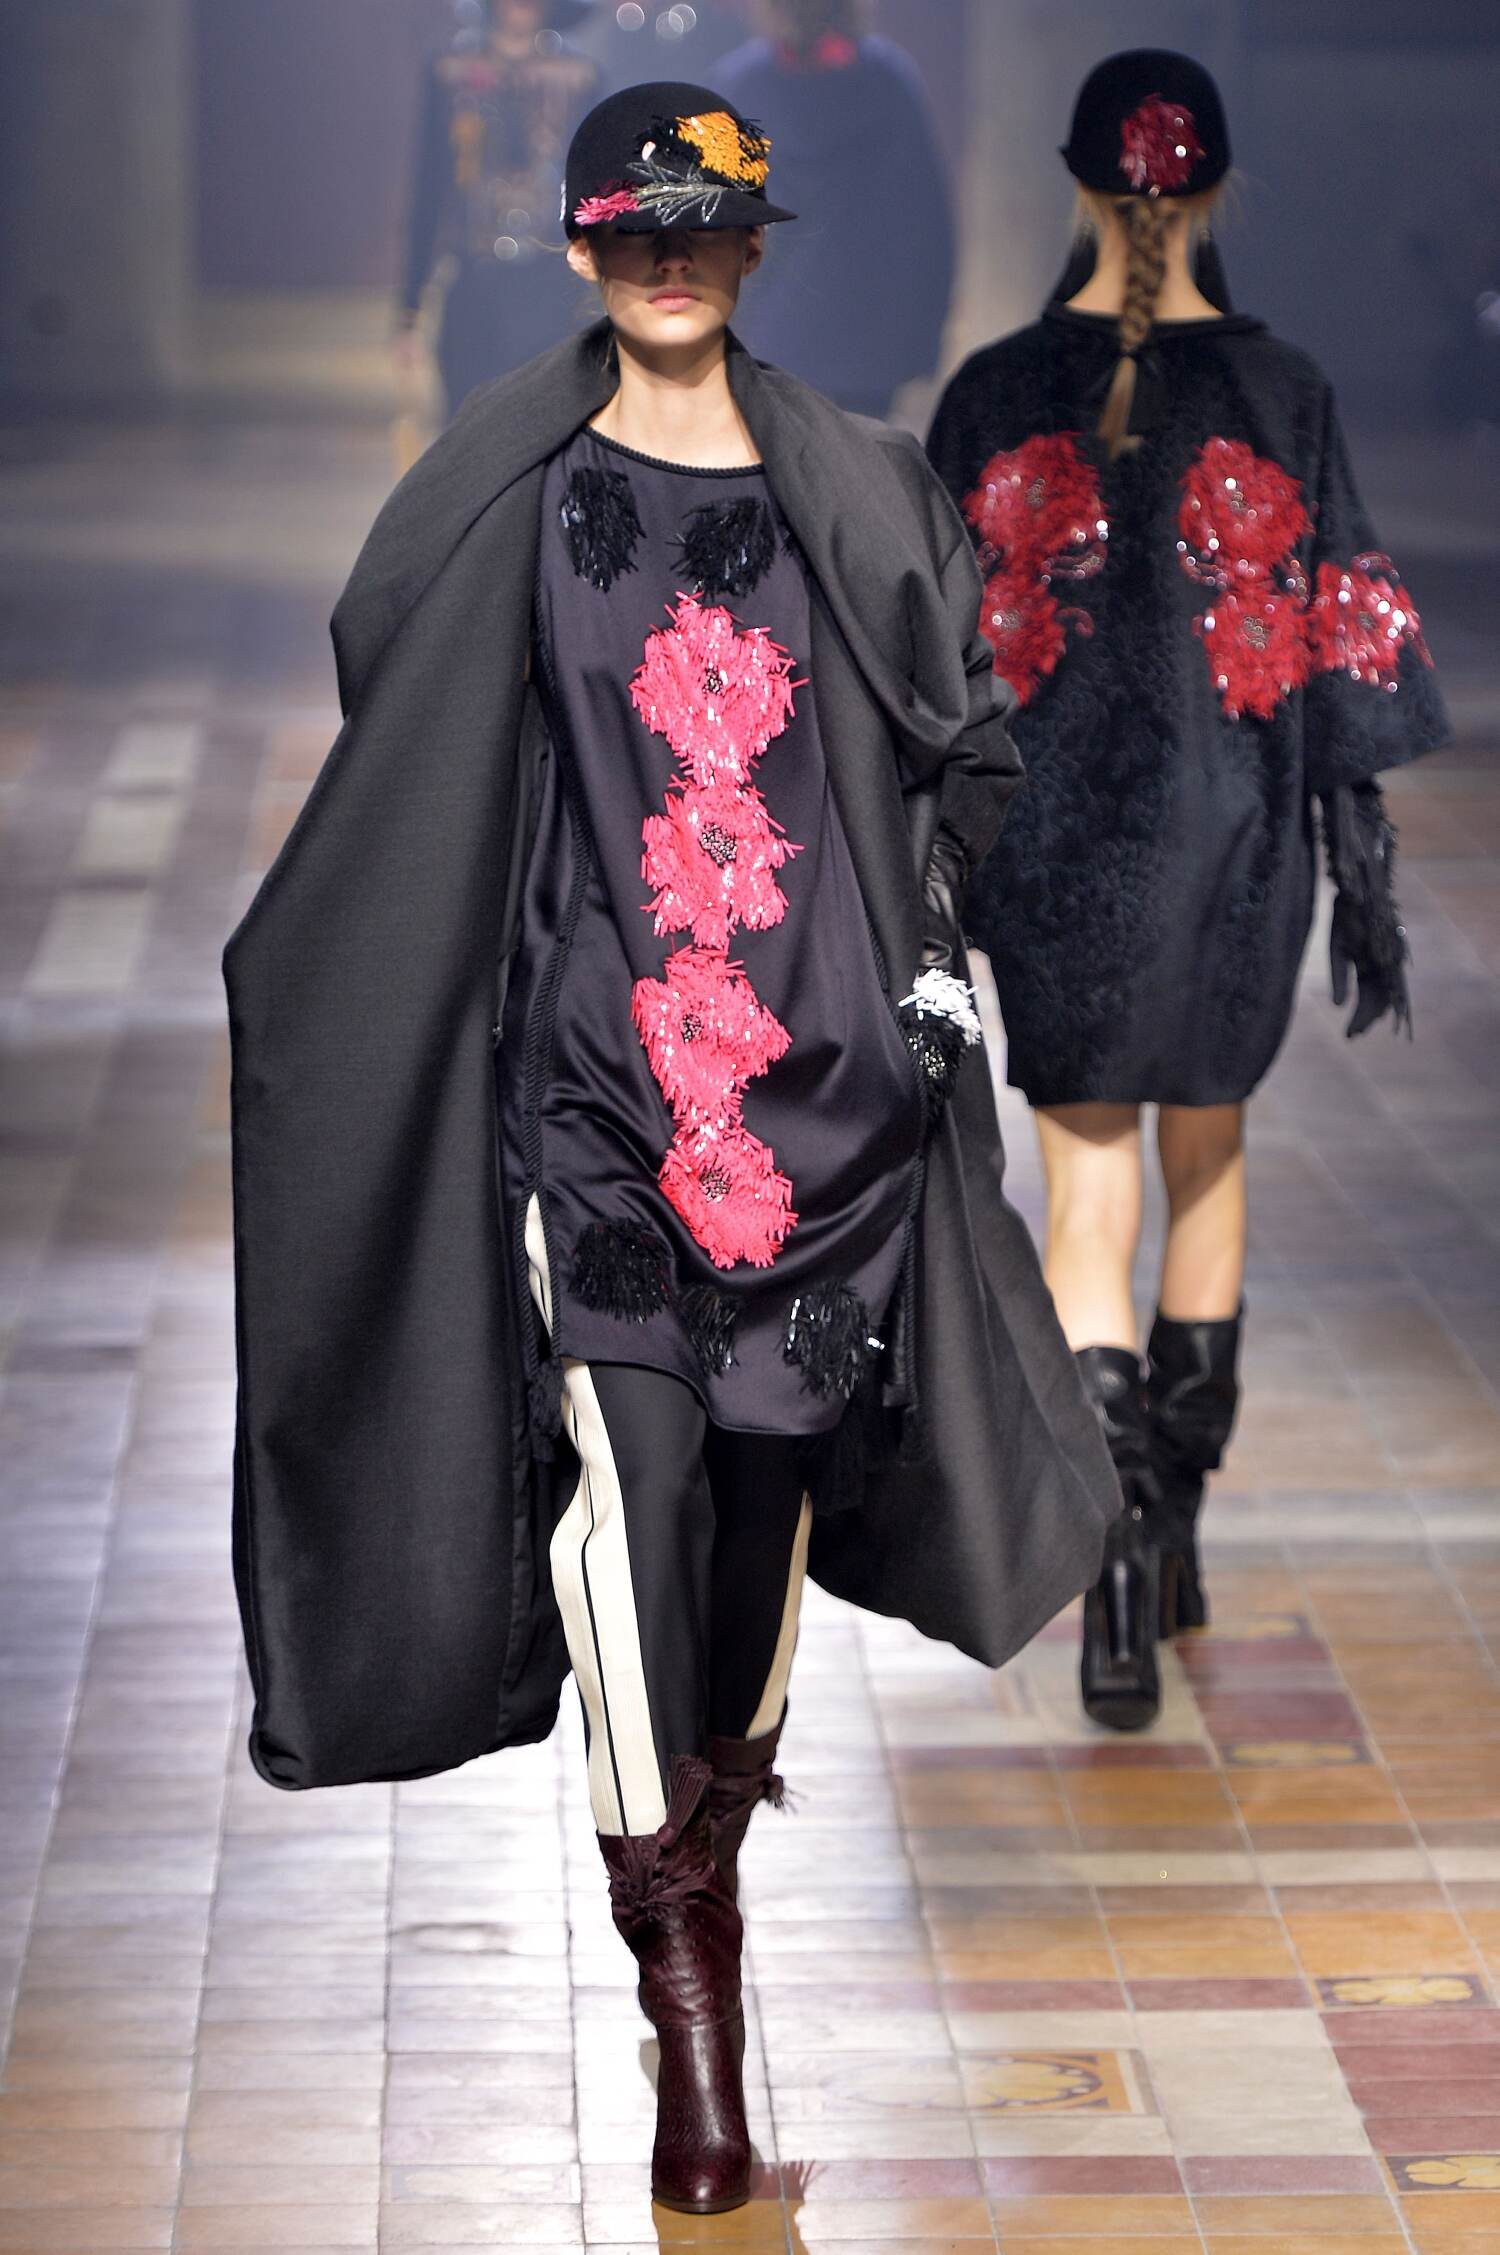 2015 16 Fall Winter Fashion Collection Lanvin